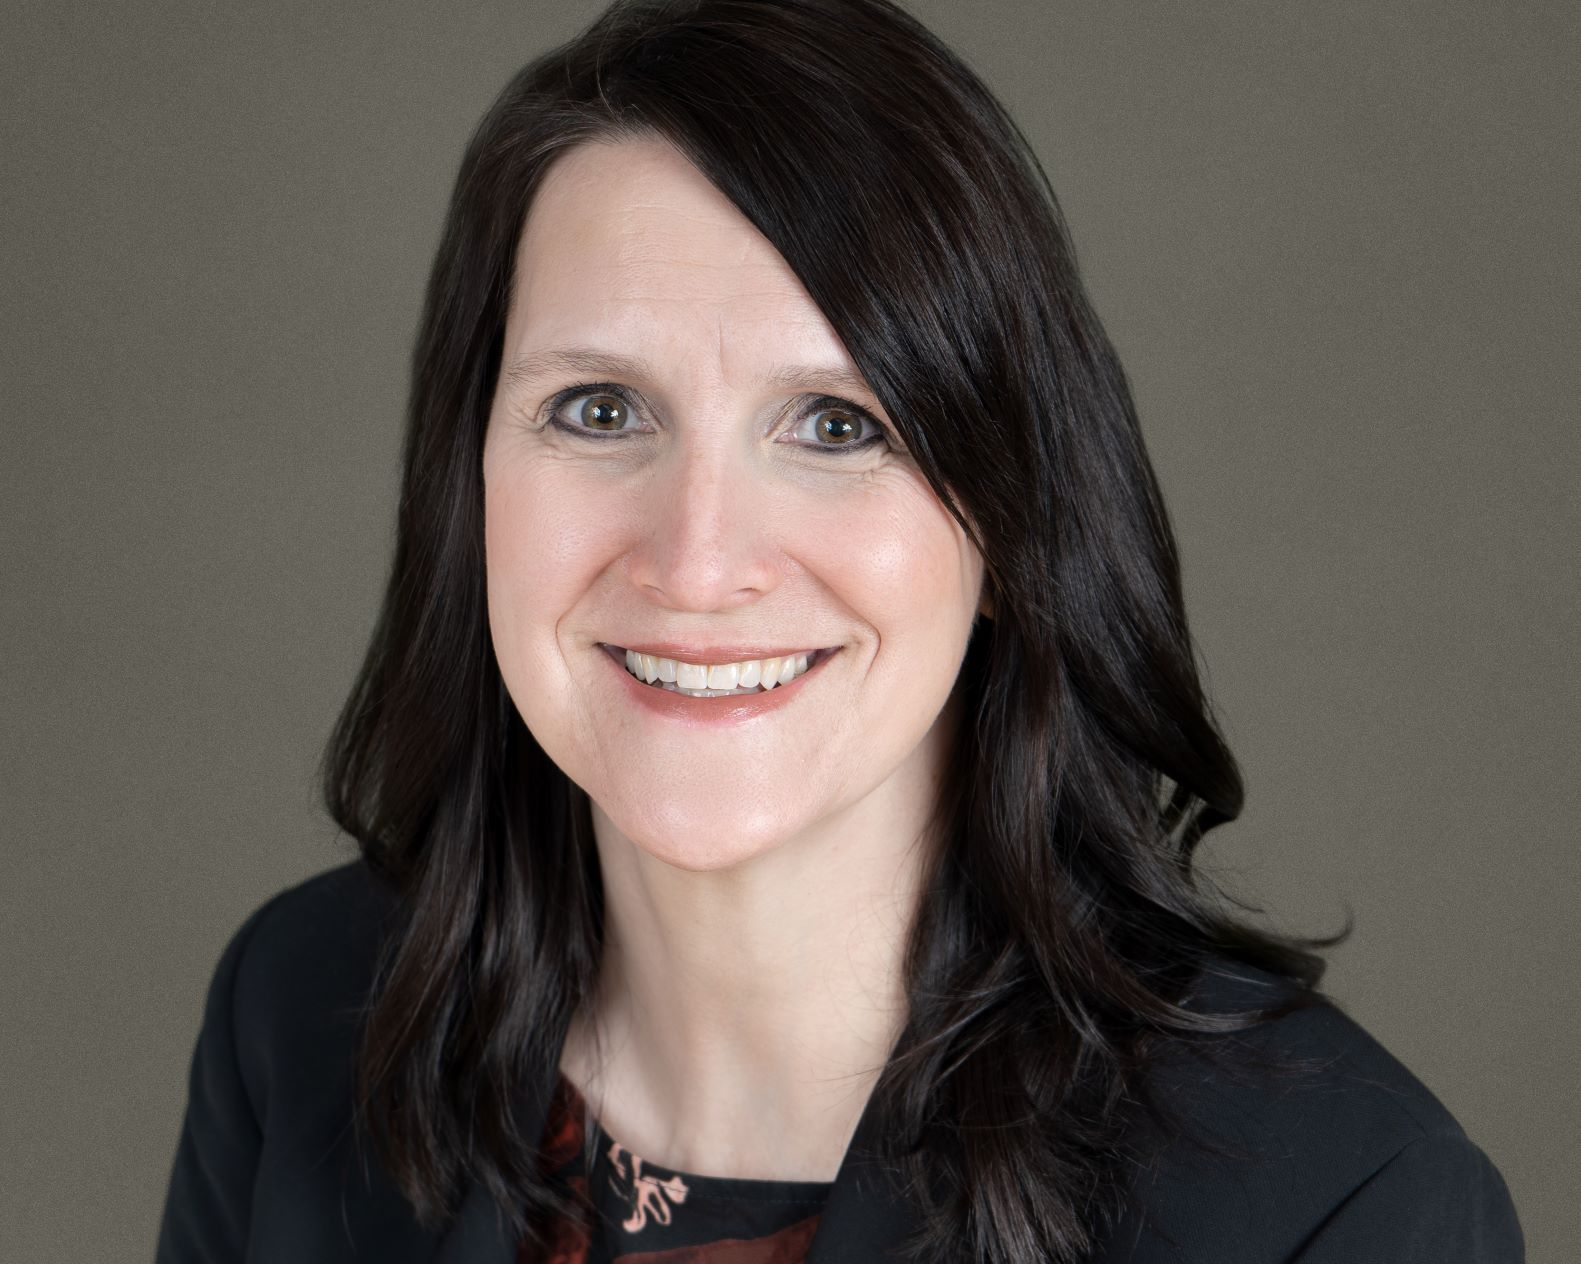 Professional portrait of Lisa Vetsch